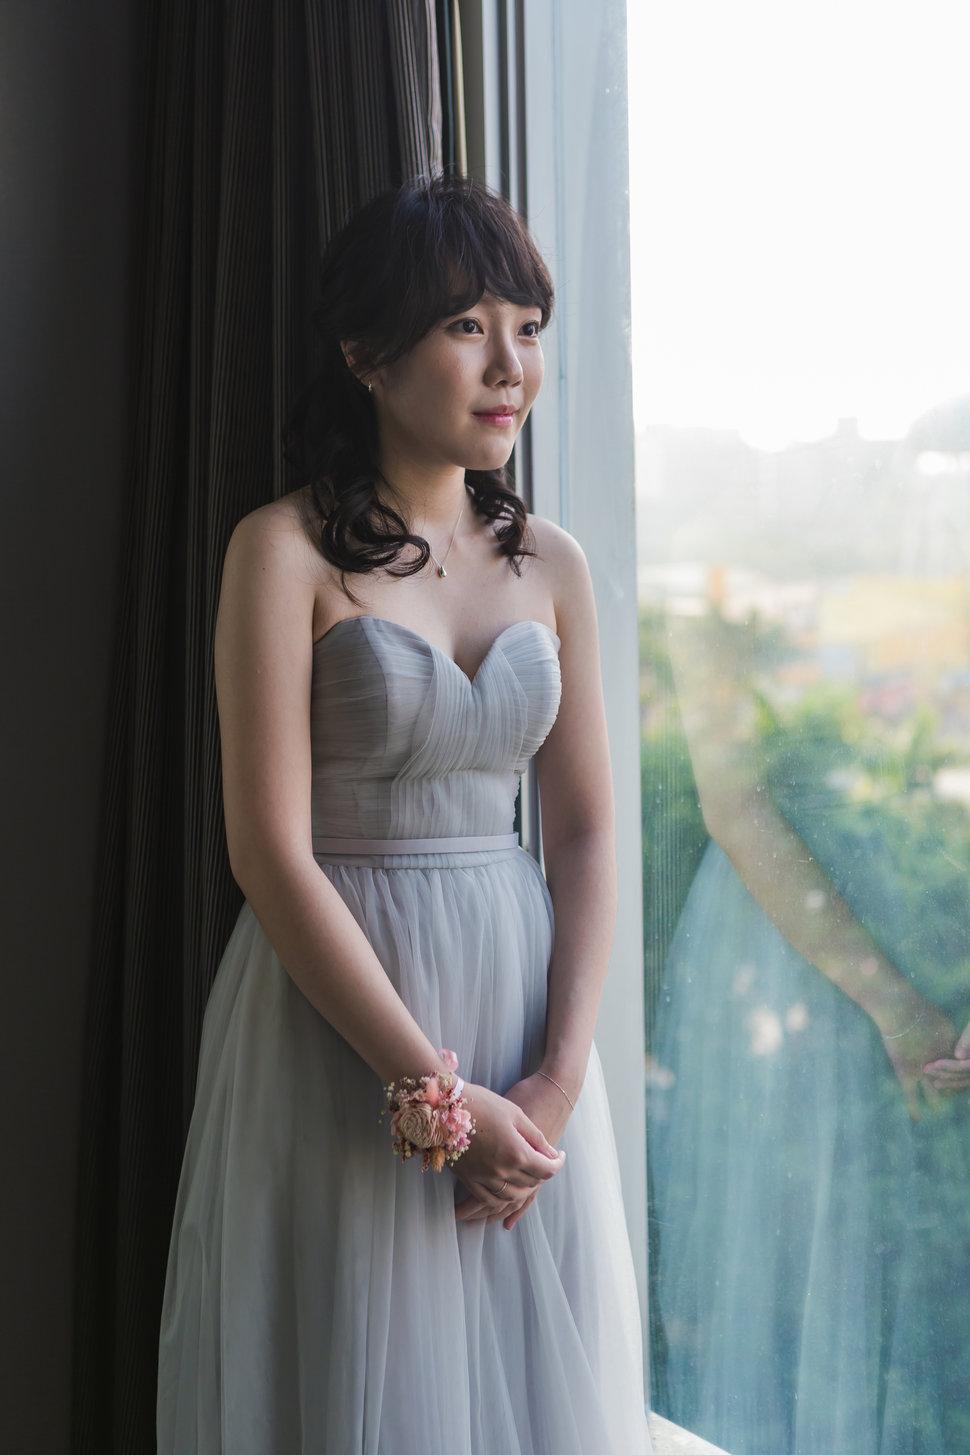 IMG_0974 - syuan影像紀錄 - 結婚吧